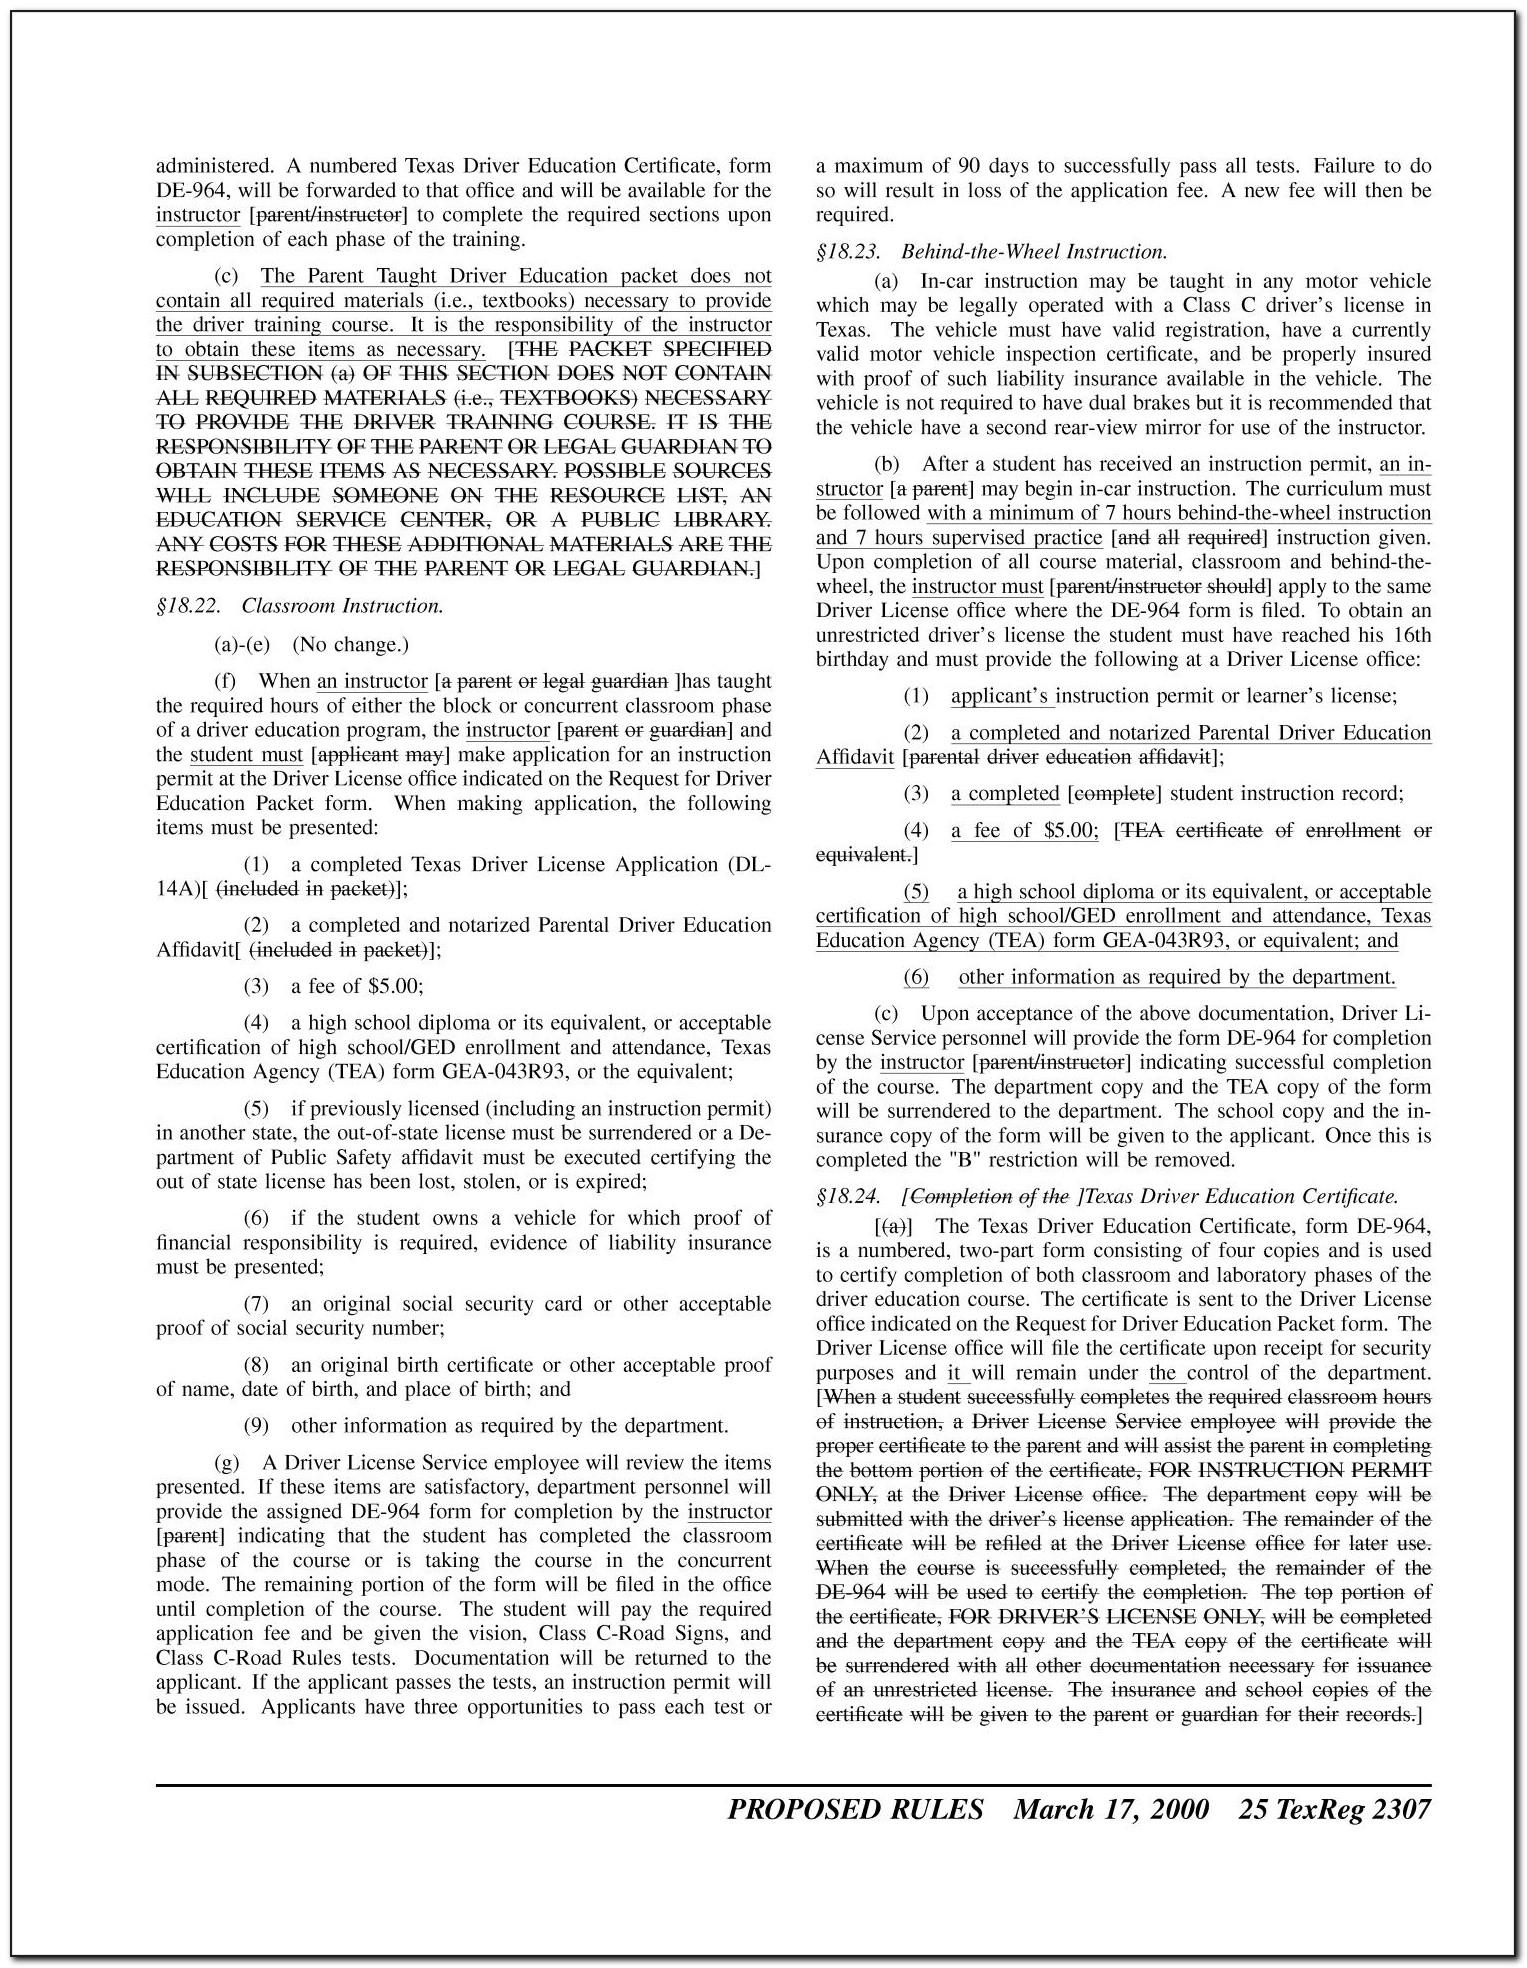 Texas Driver Education Certificate Of Completion (de 964 Or De 964e)